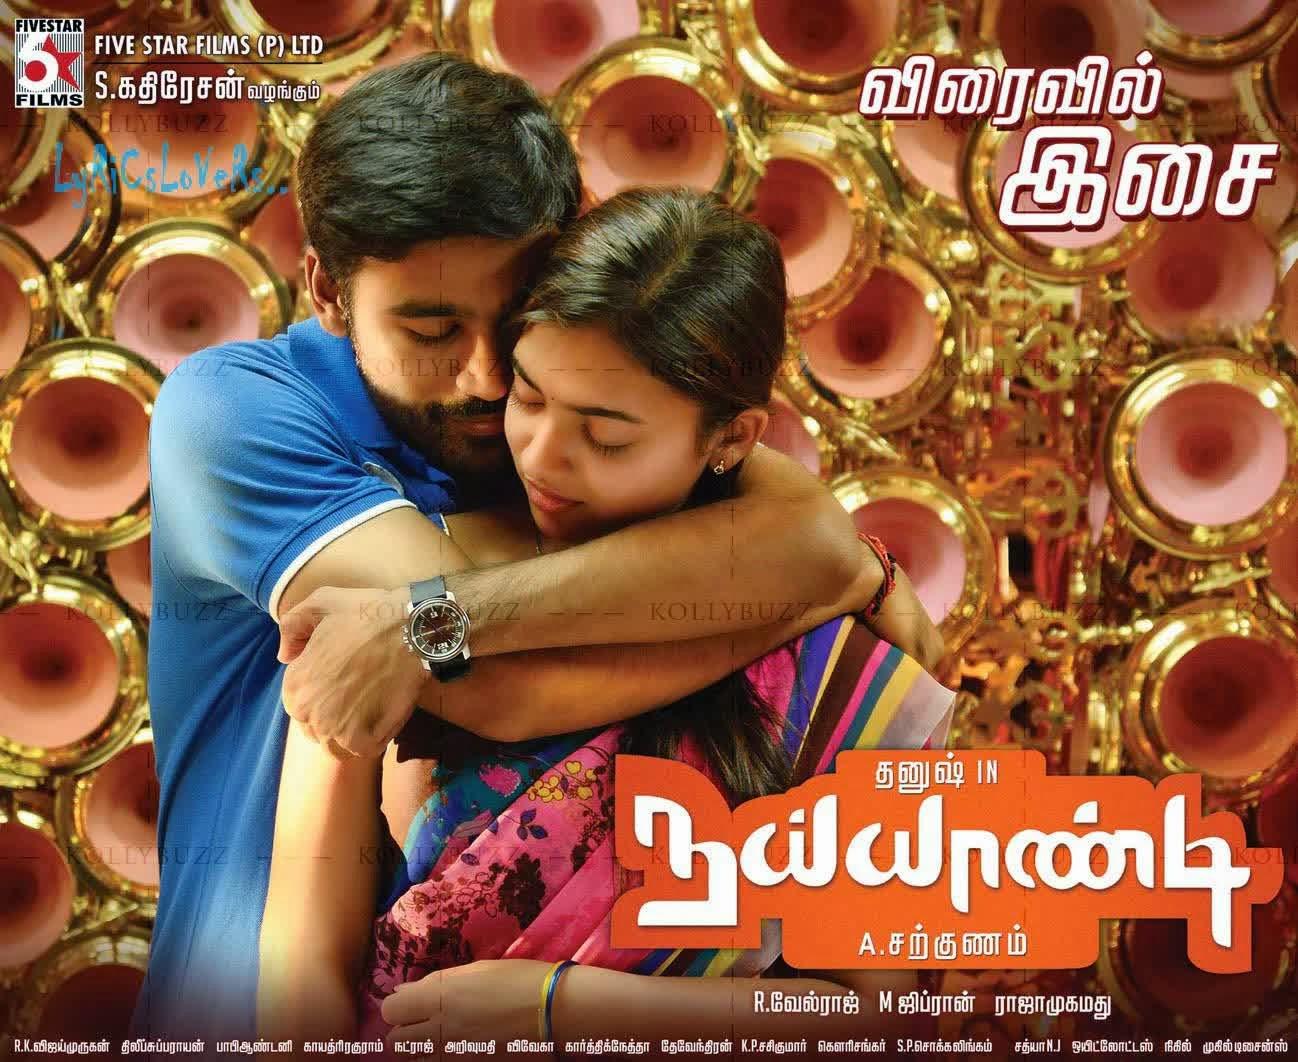 Tamil movie song | lyrics lovers.